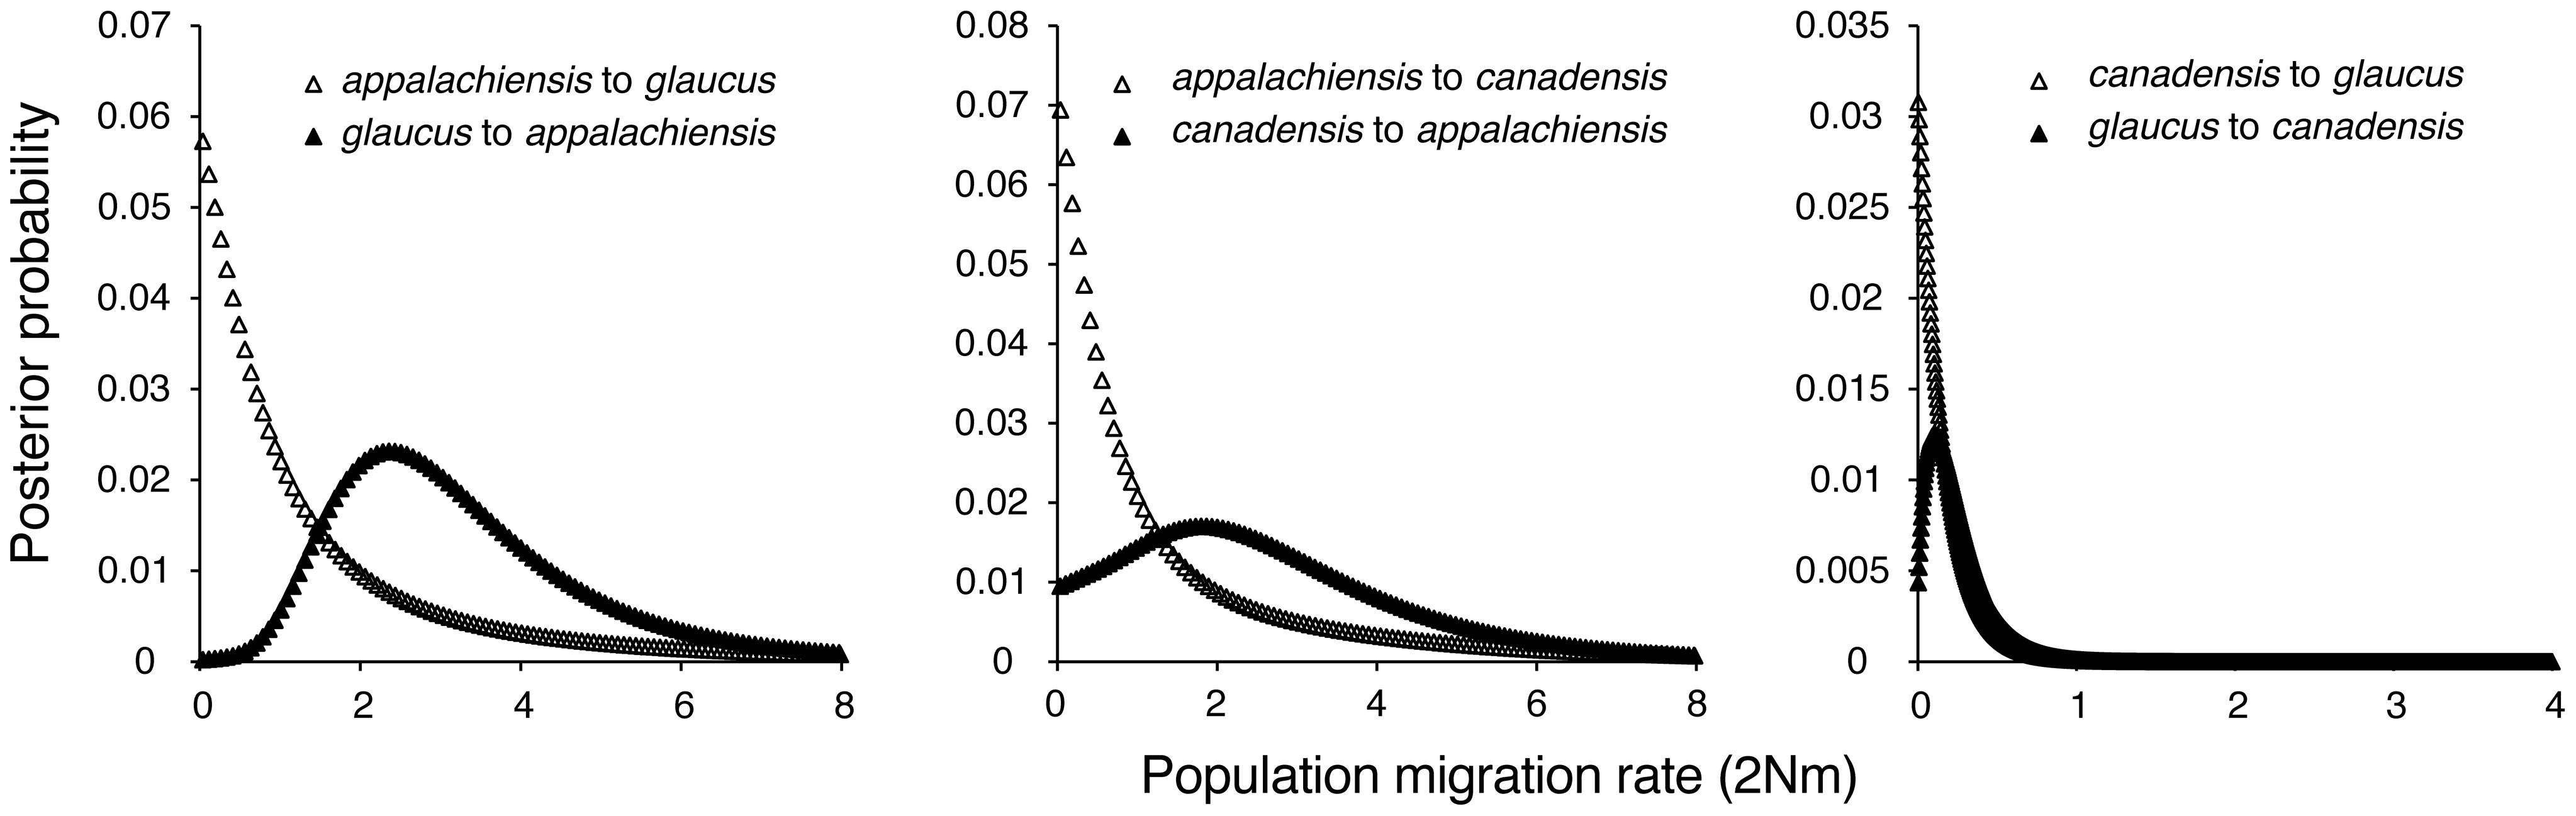 Estimated gene flow among <i>appalachiensis</i>, <i>glaucus</i>, and <i>canadensis</i>.